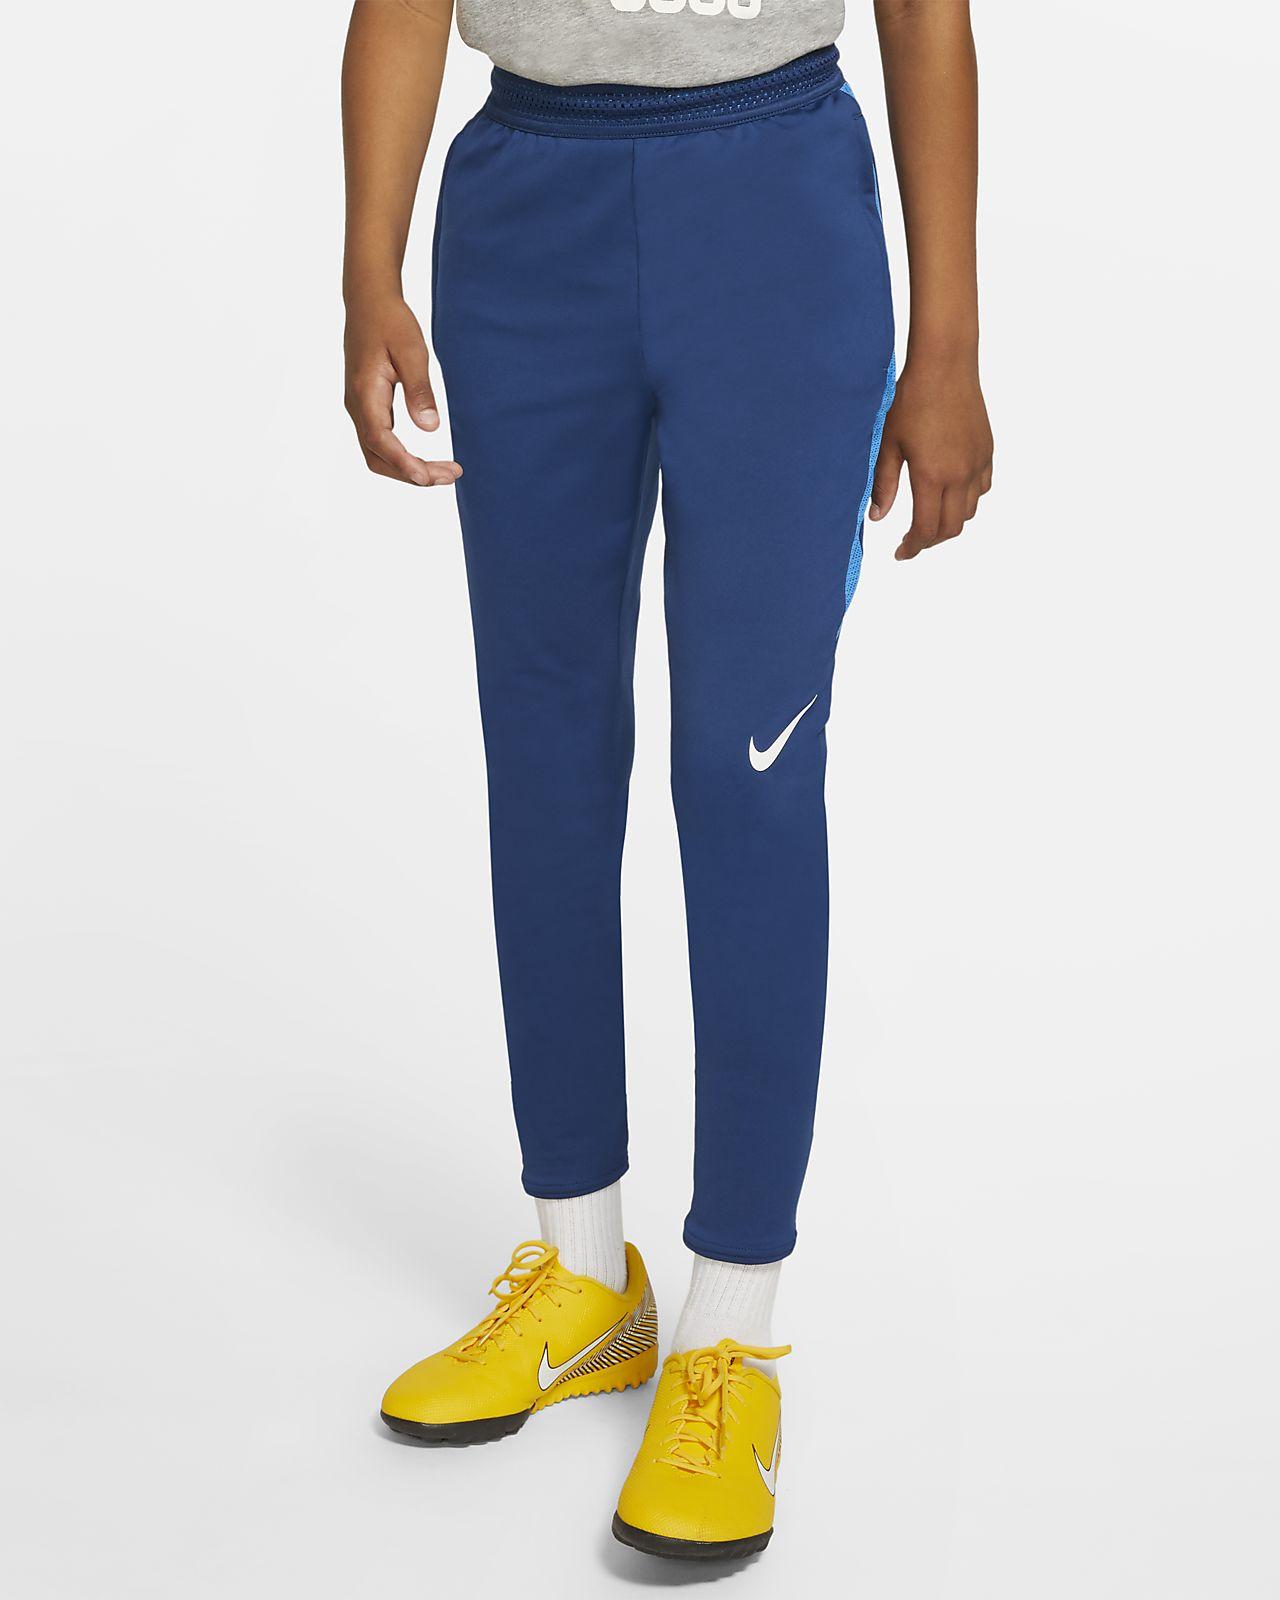 Pantaloni da calcio Nike Dri-FIT Strike - Ragazzo